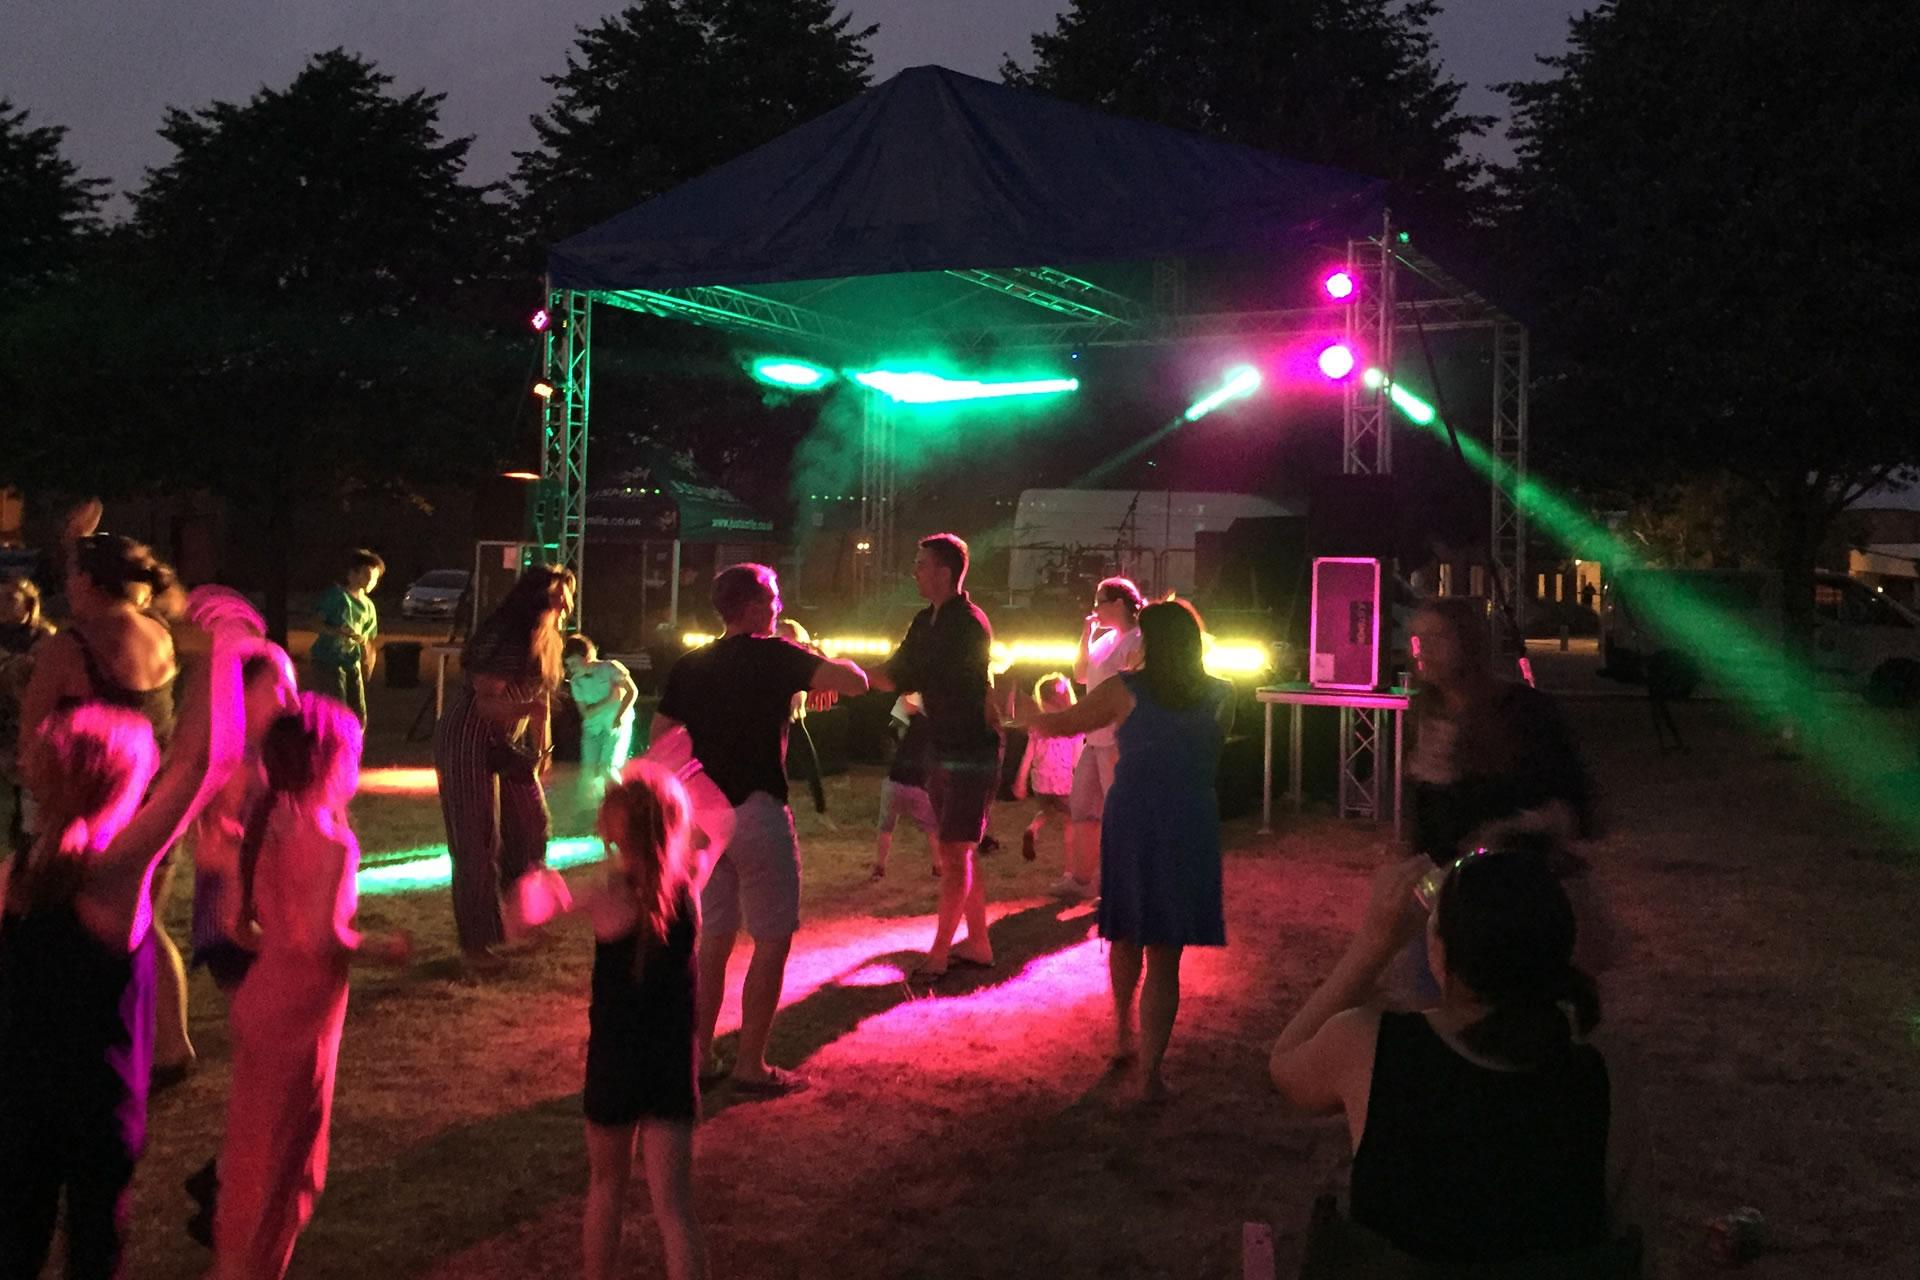 lighting-band-stage_r1_c1